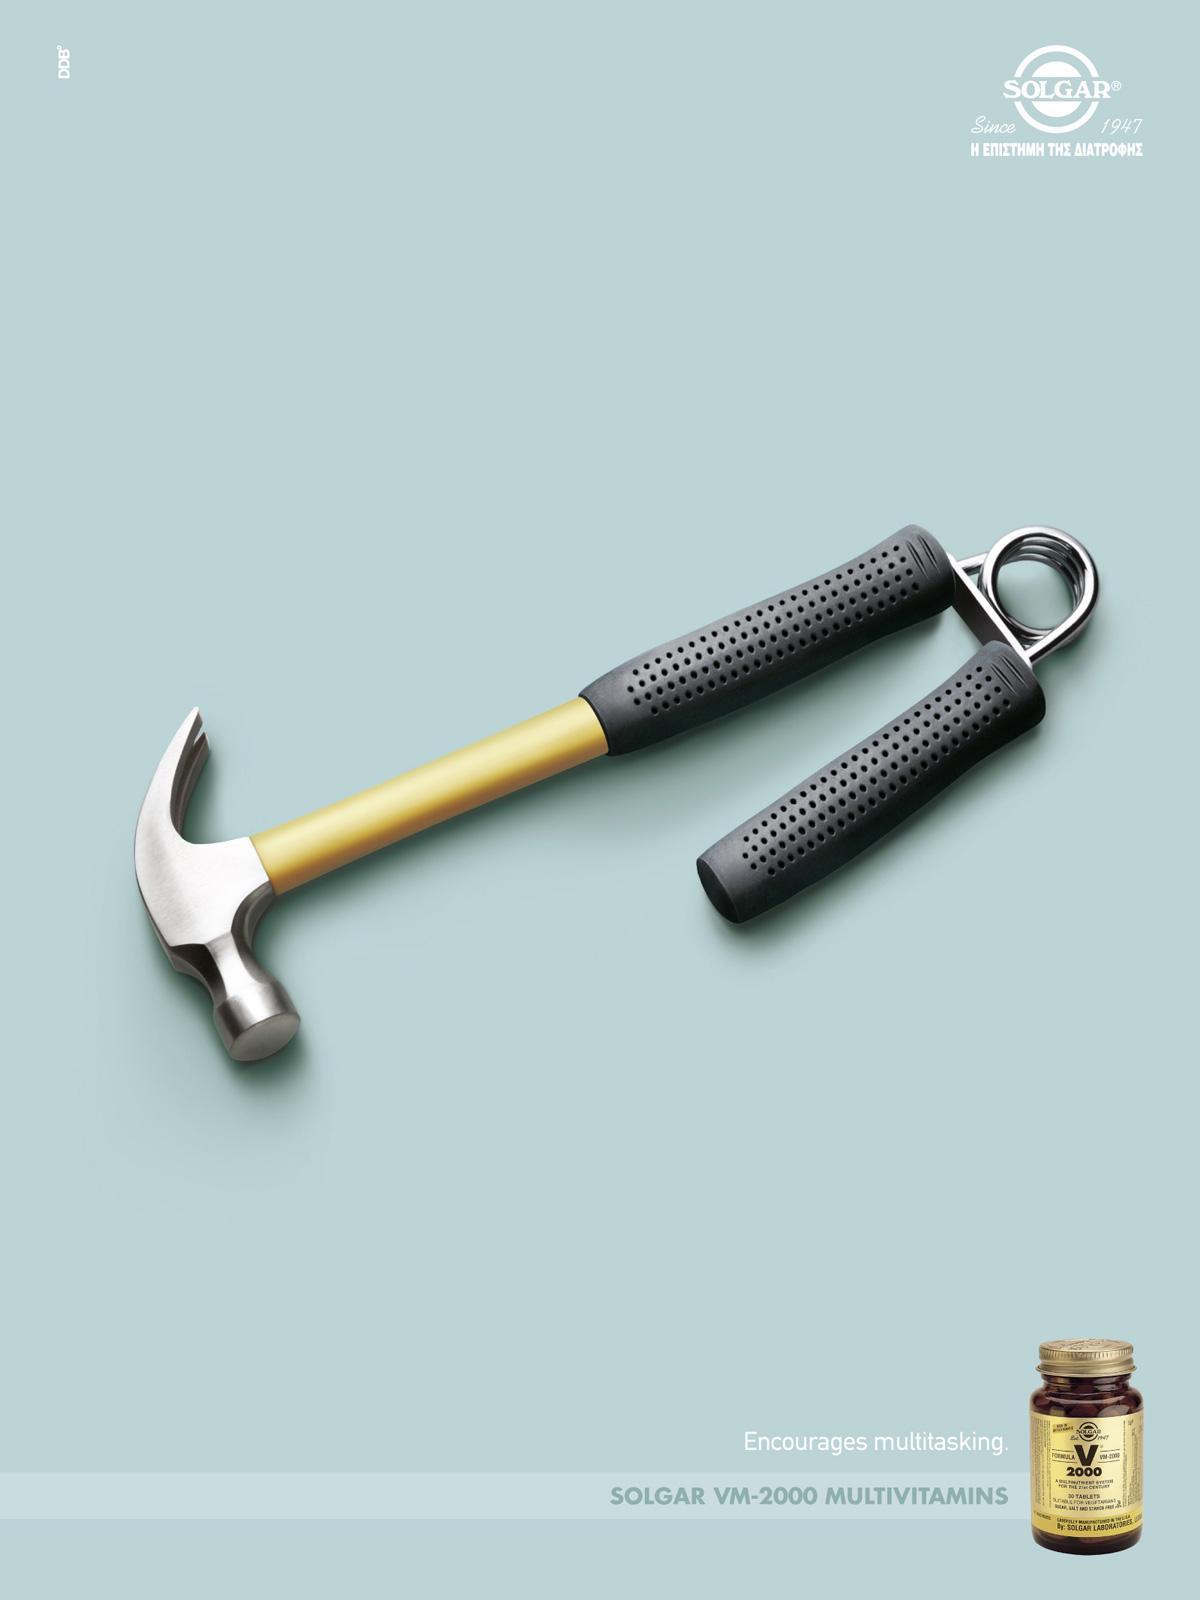 Solgar Print Ad -  Encourages multitasking, 3